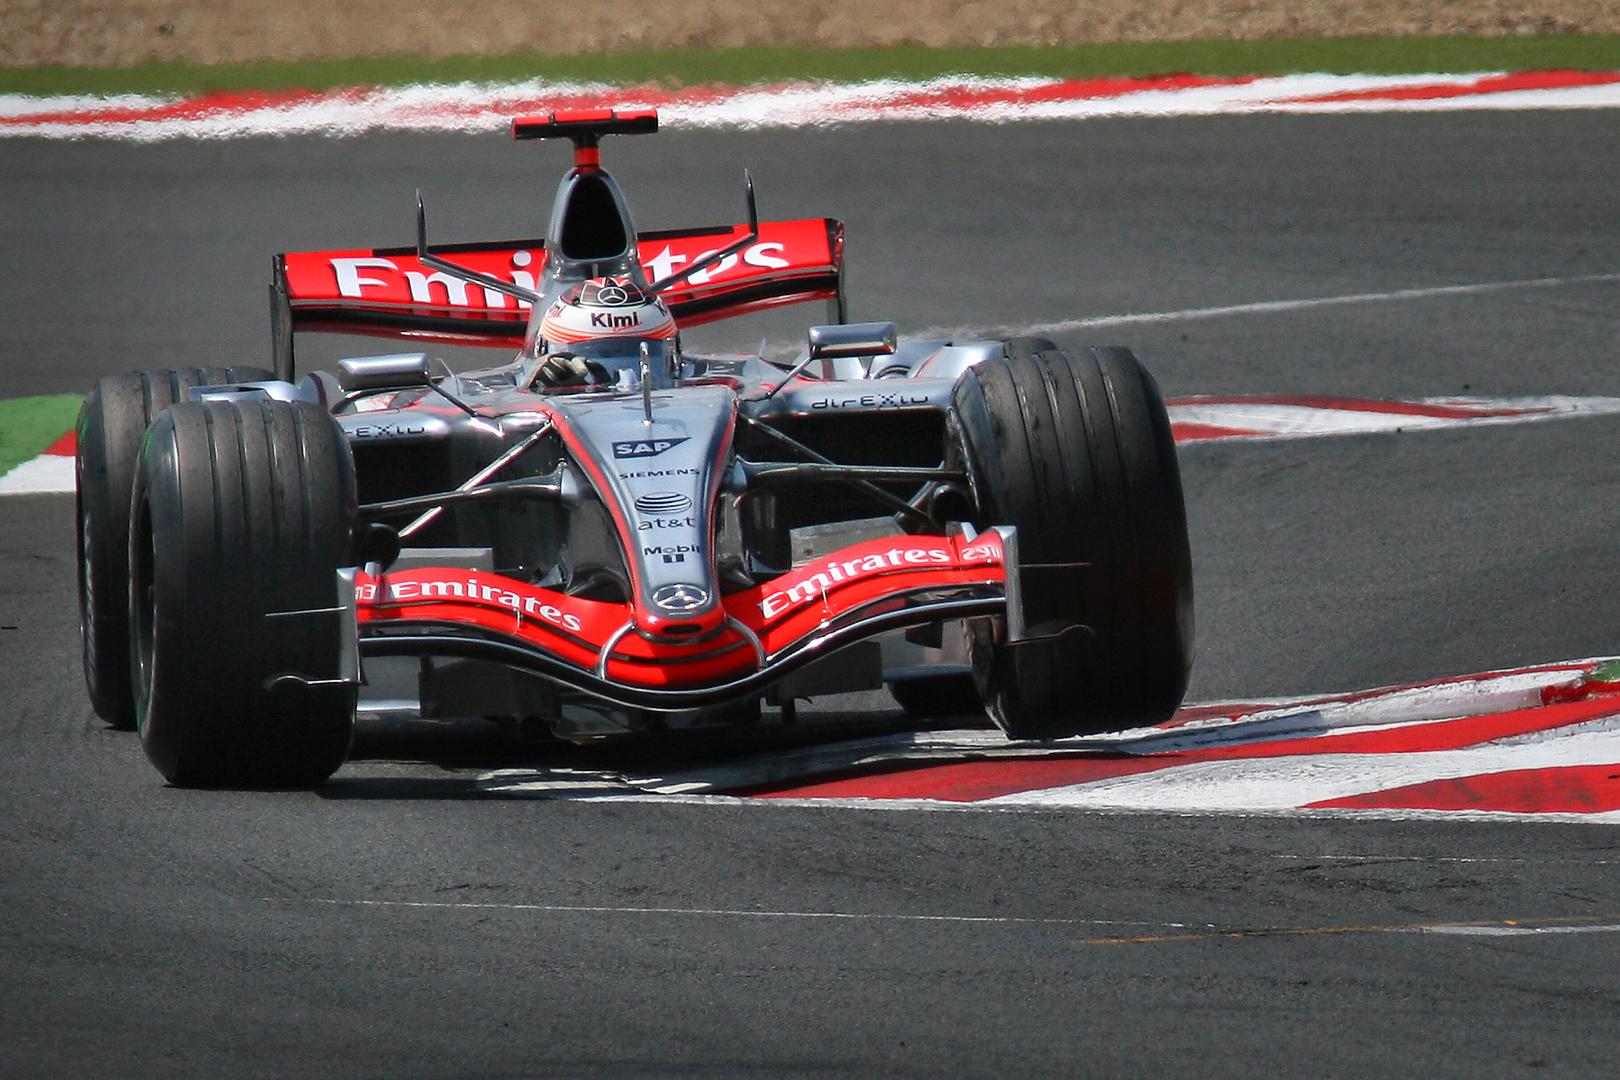 GP FRANCE F1 2006